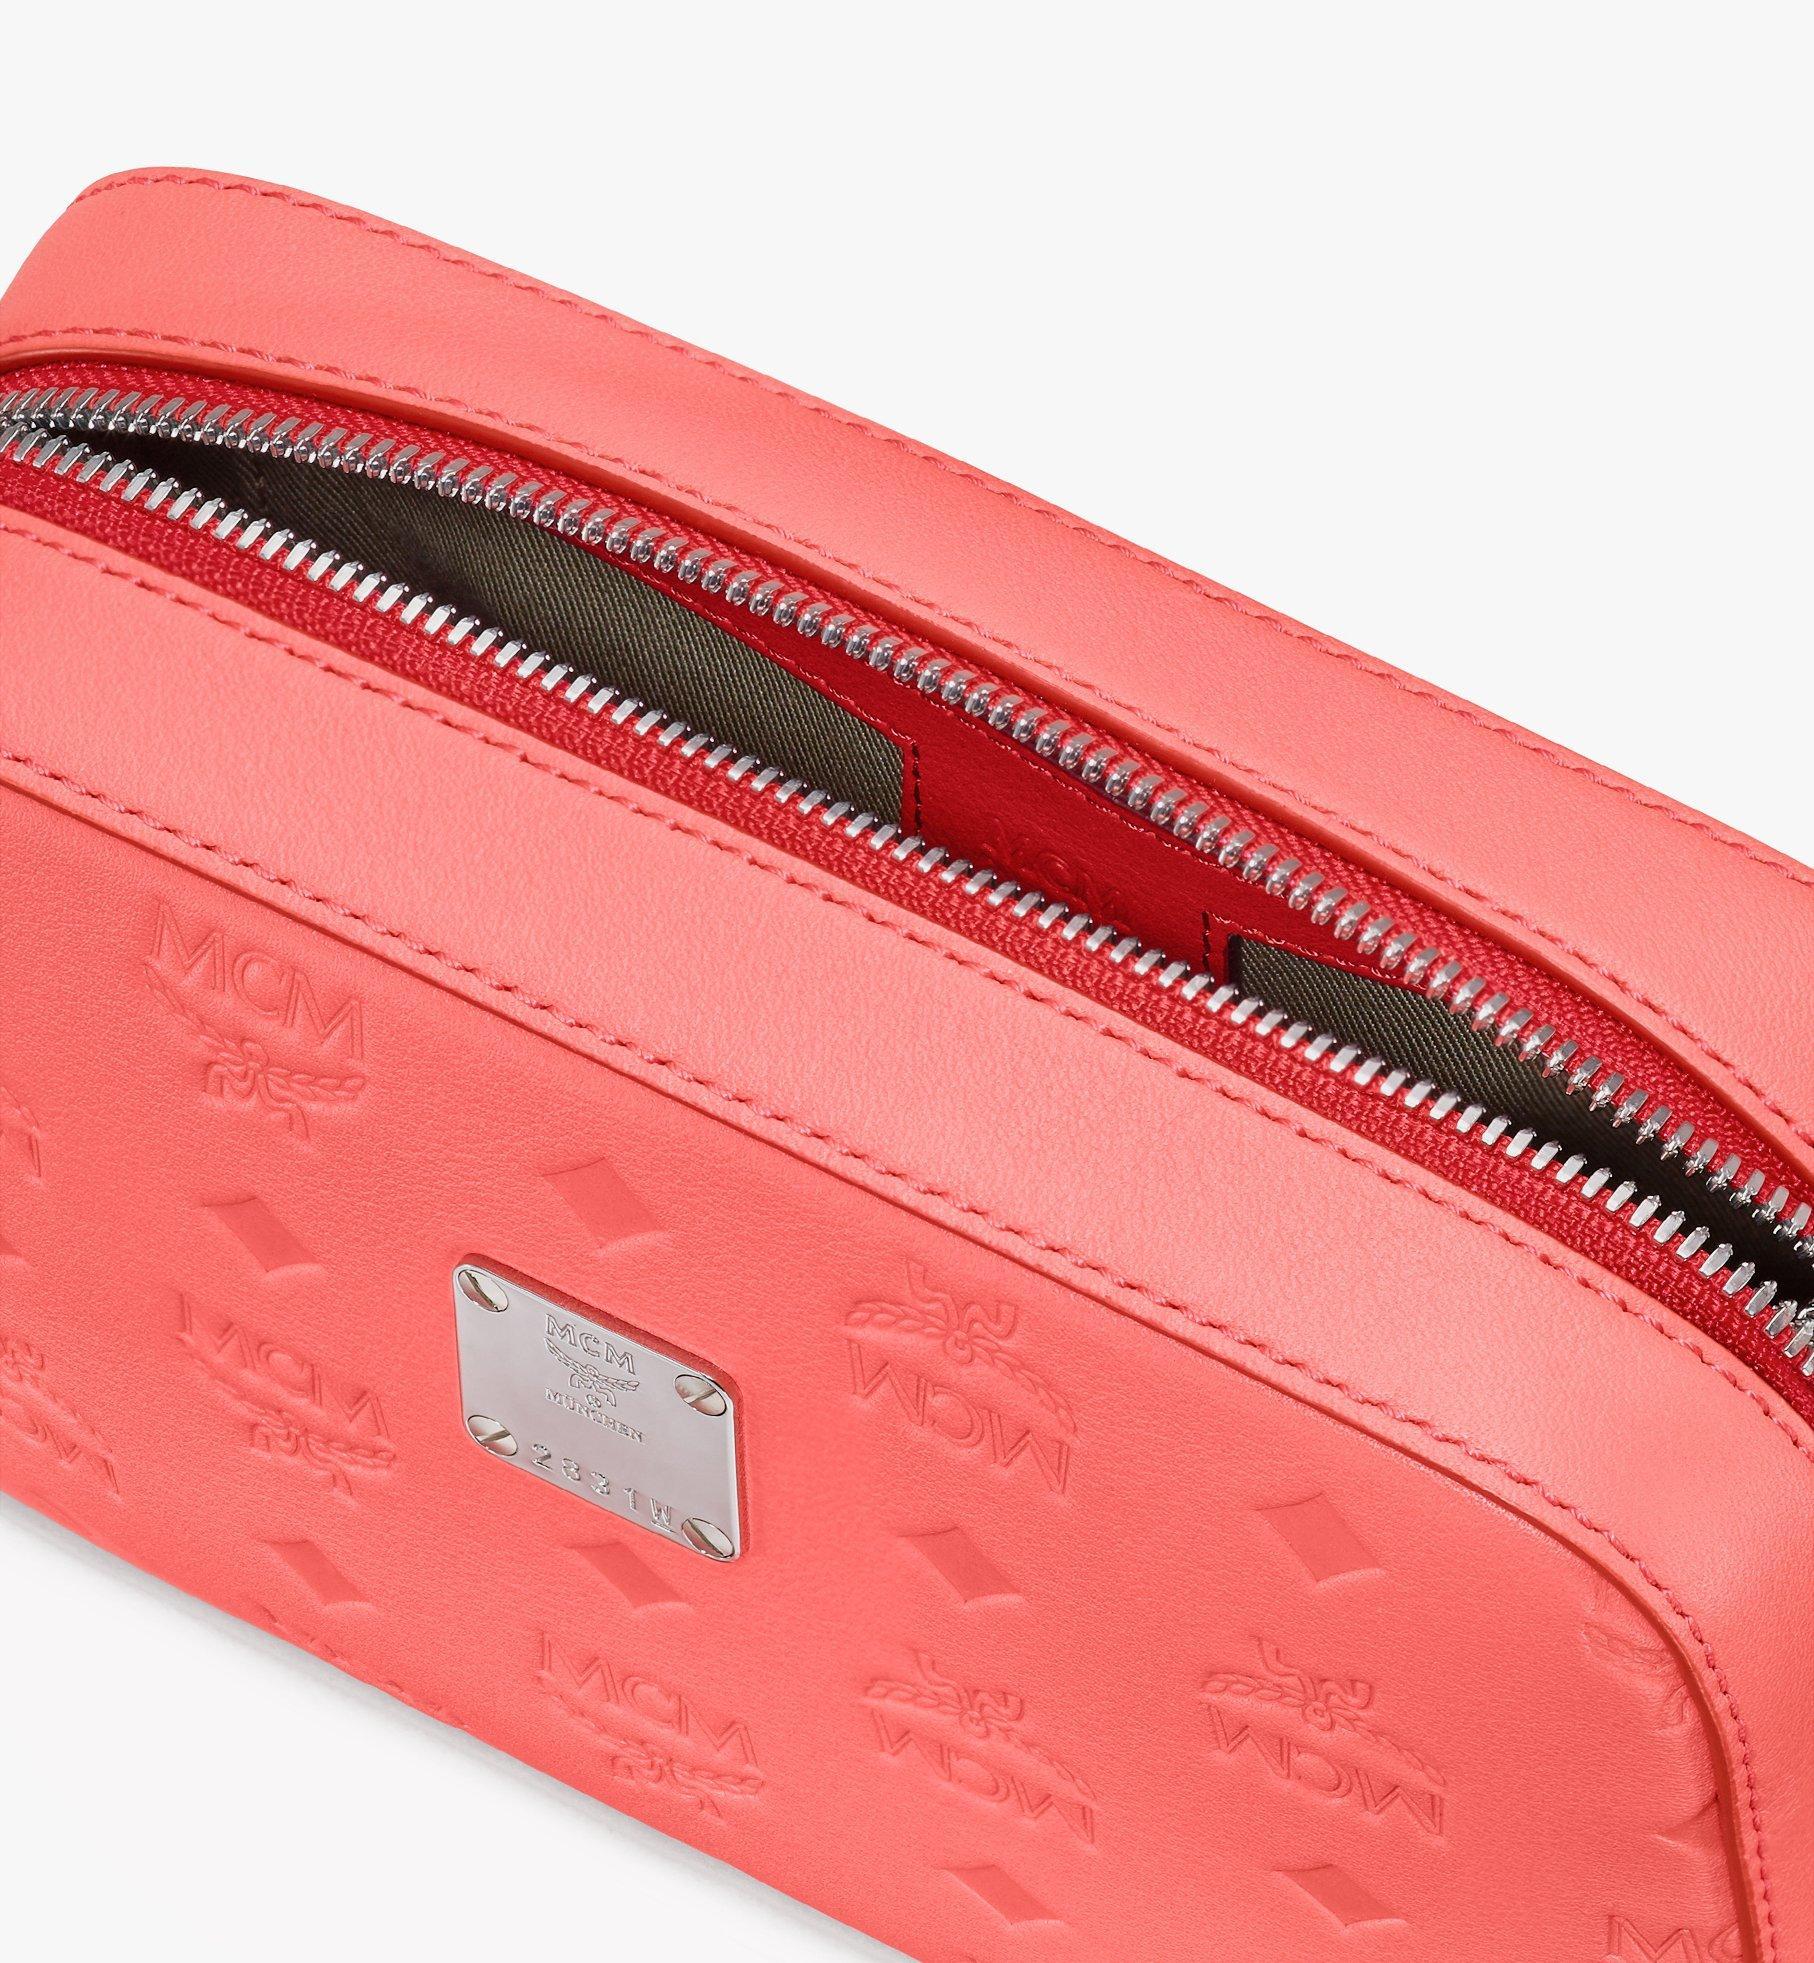 MCM Camera Bag in Monogram Leather Red MWRASKM01O3001 Alternate View 4